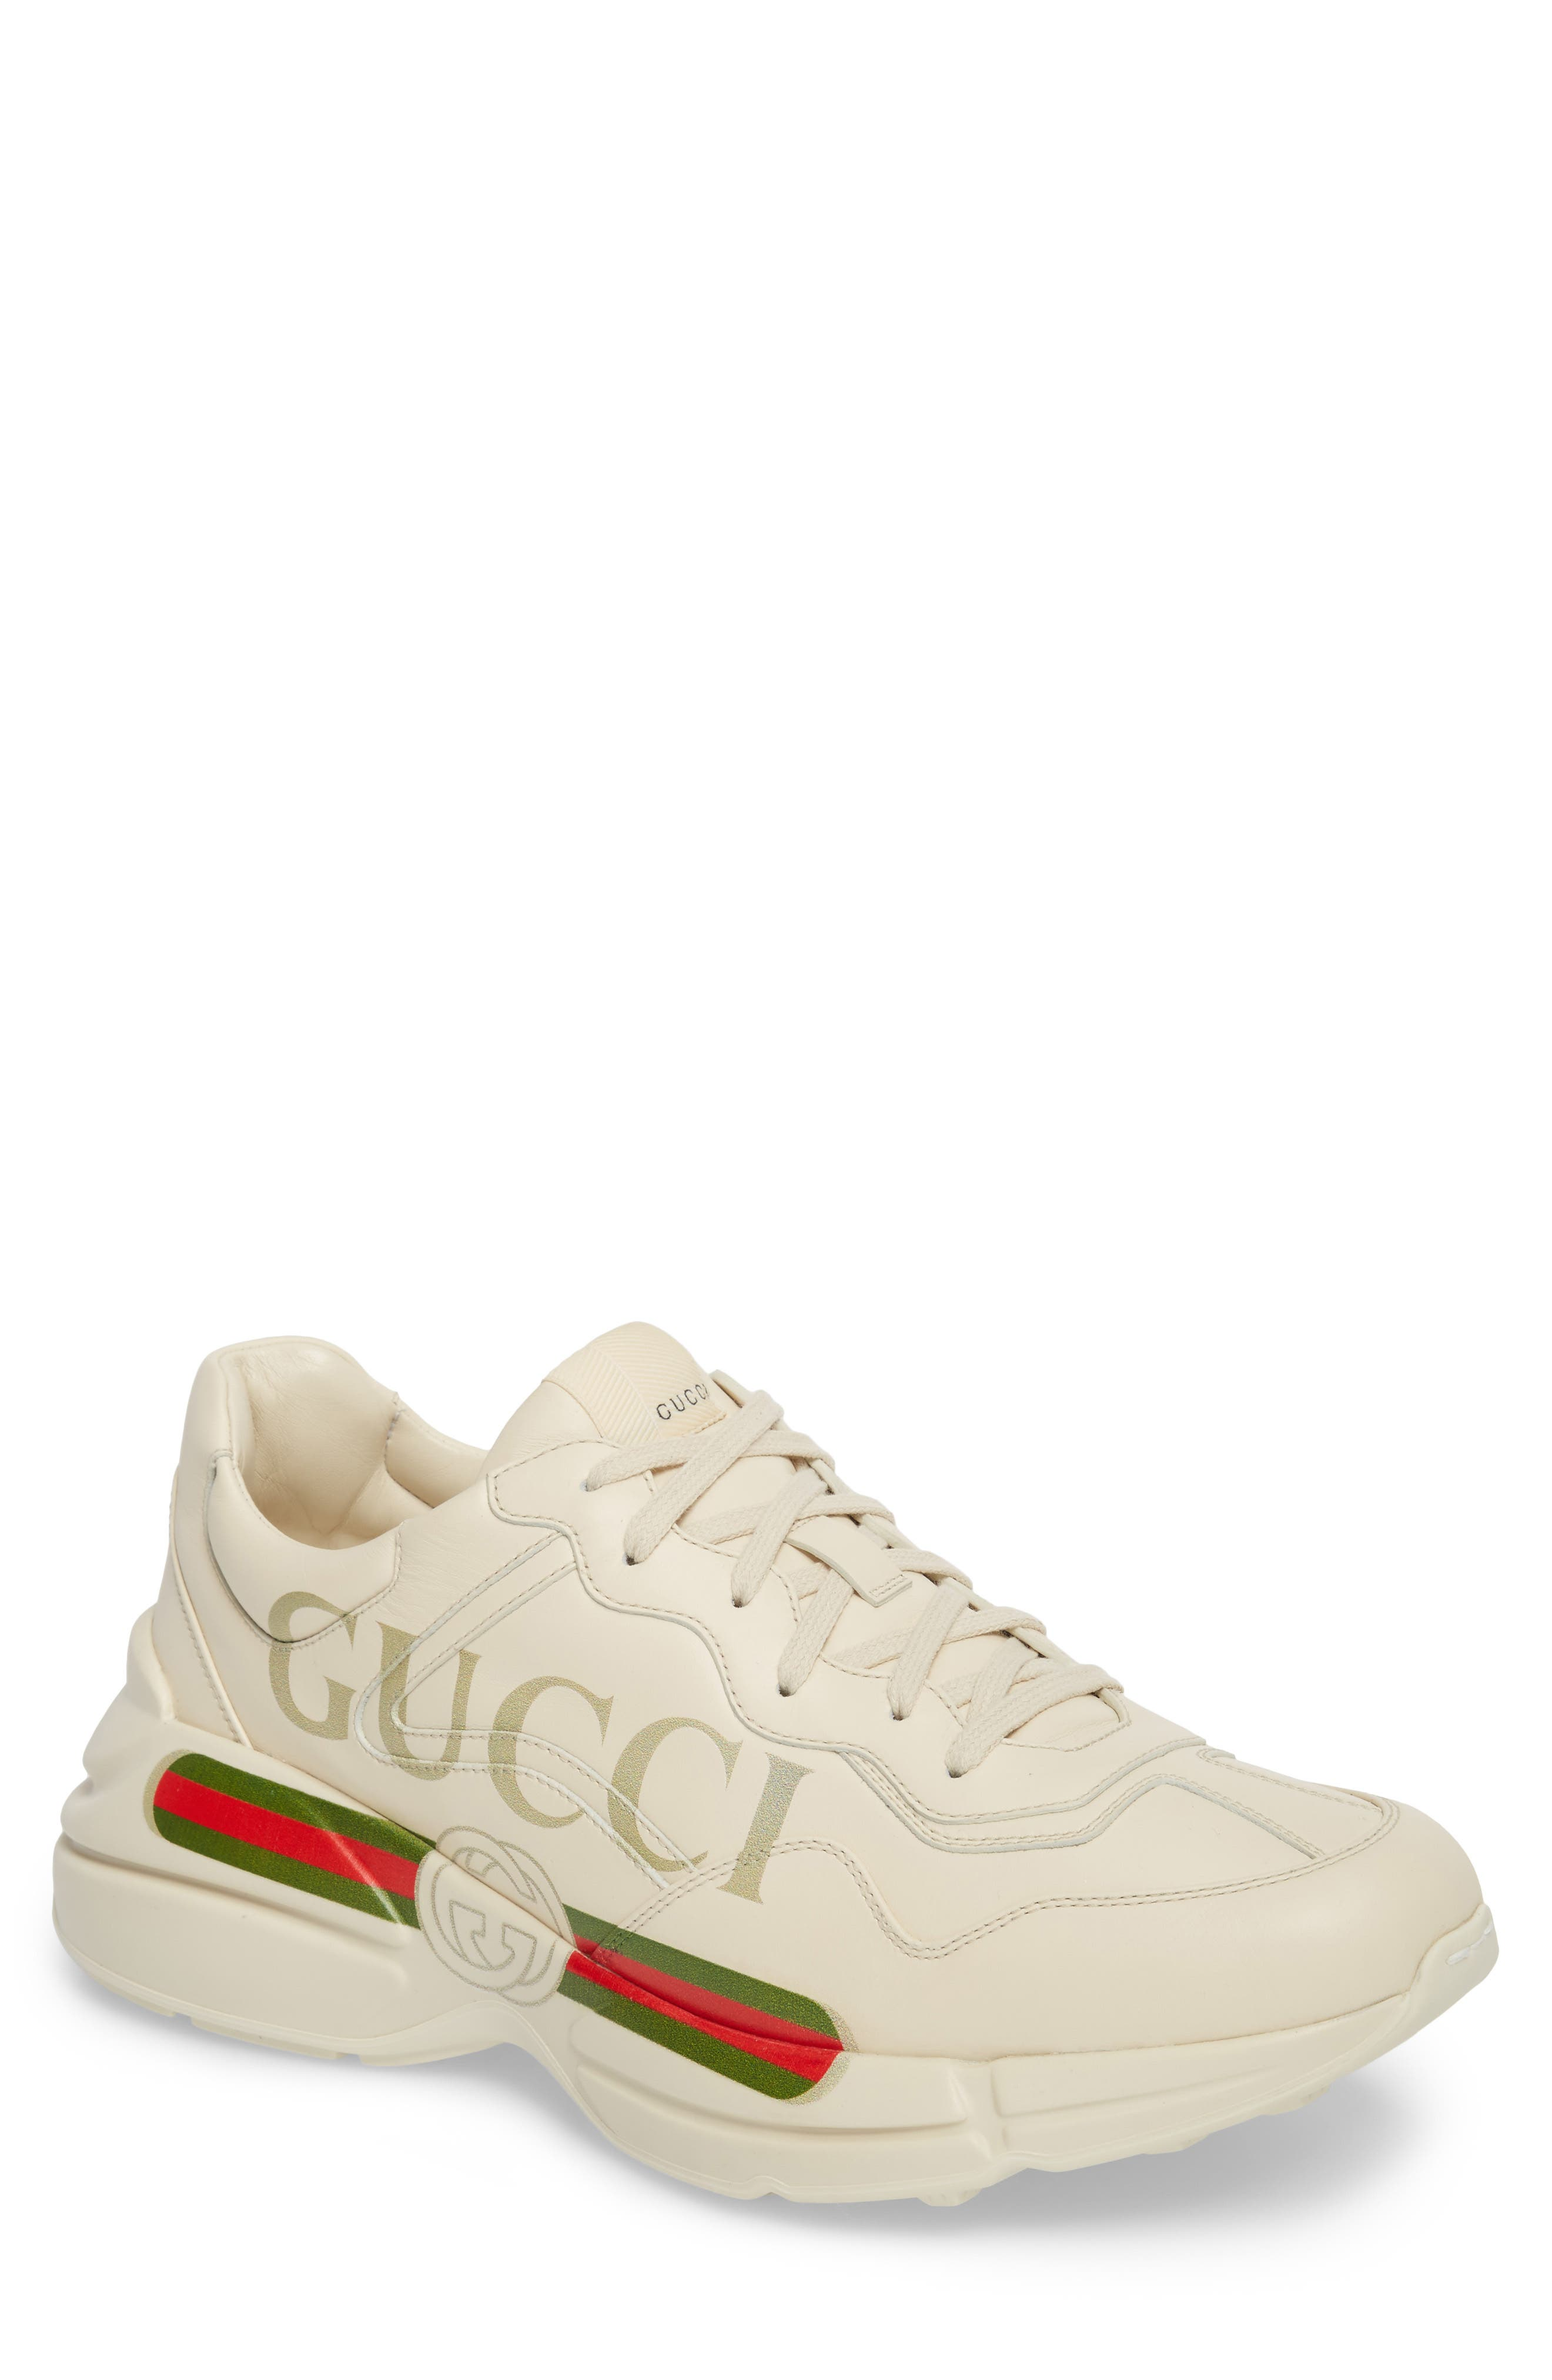 GUCCI Logo Leather Sneaker, Main, color, WHITE PRINT